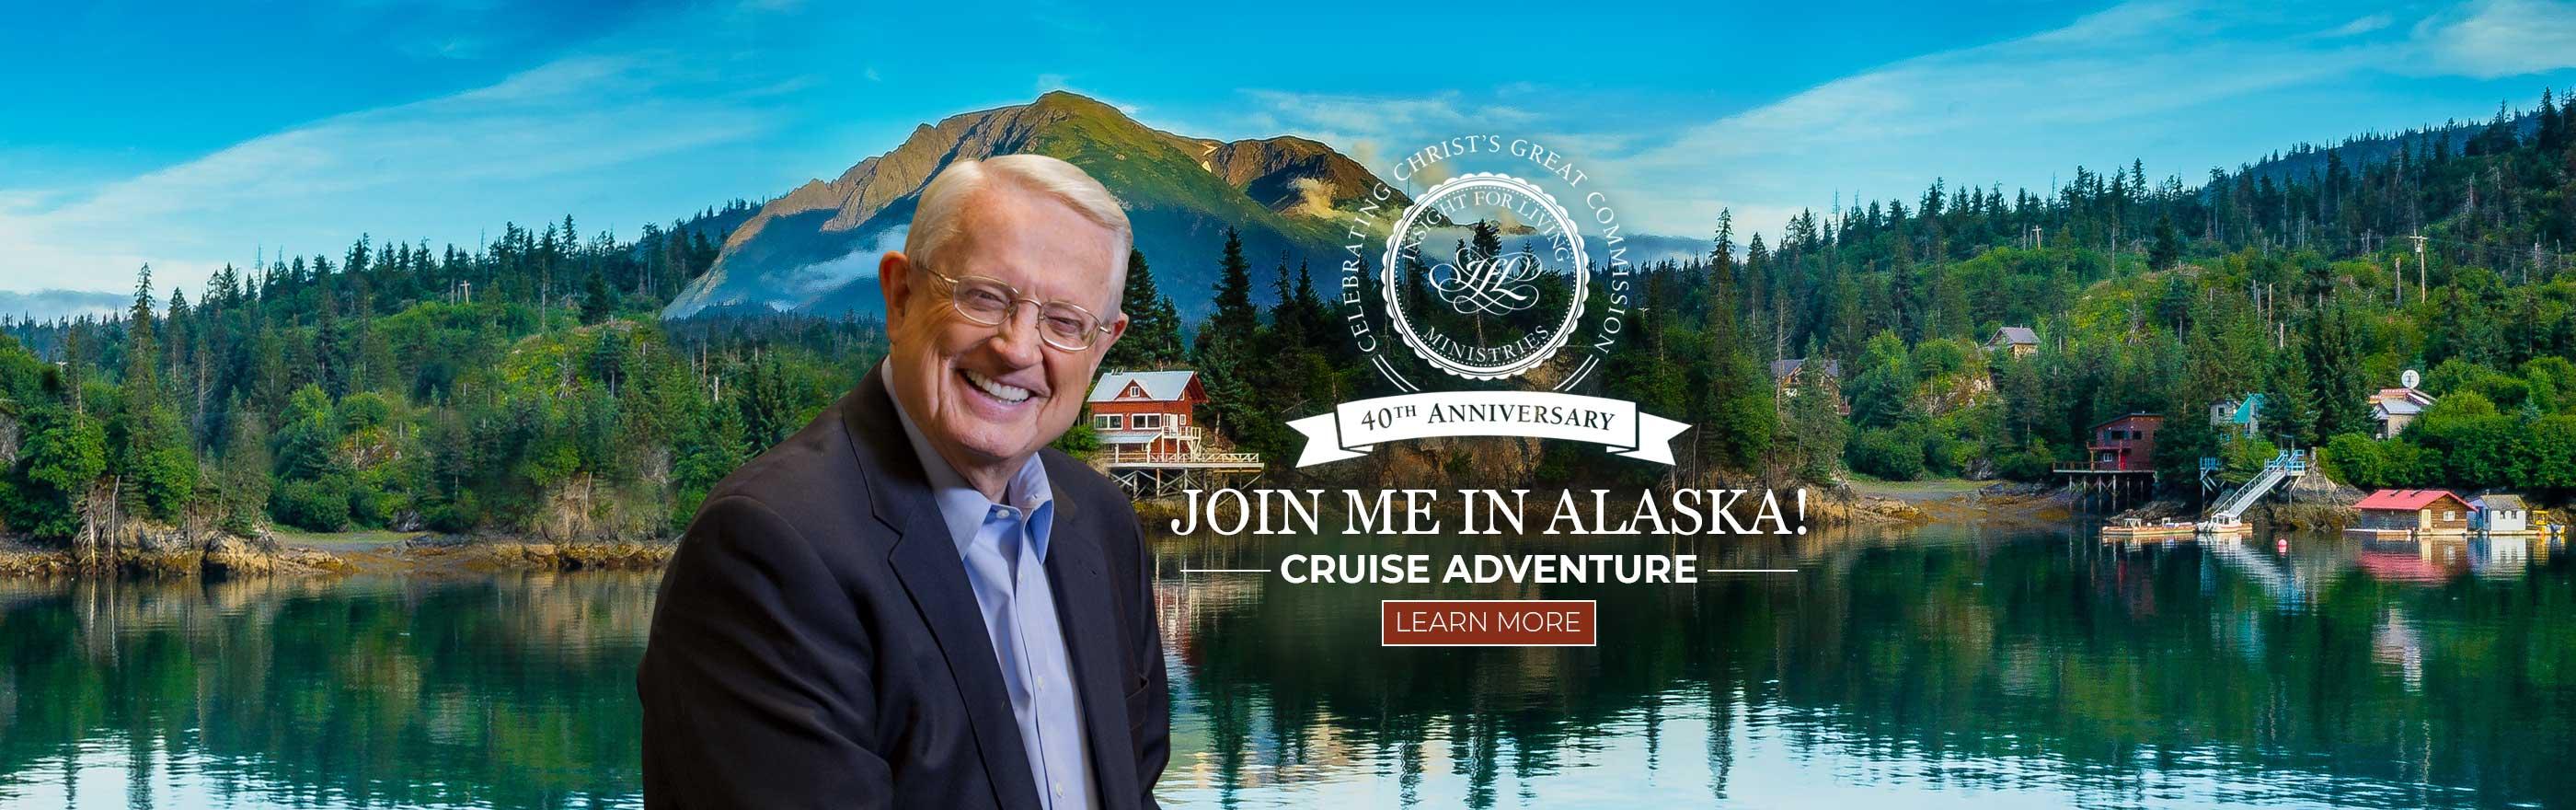 Alaska 2019